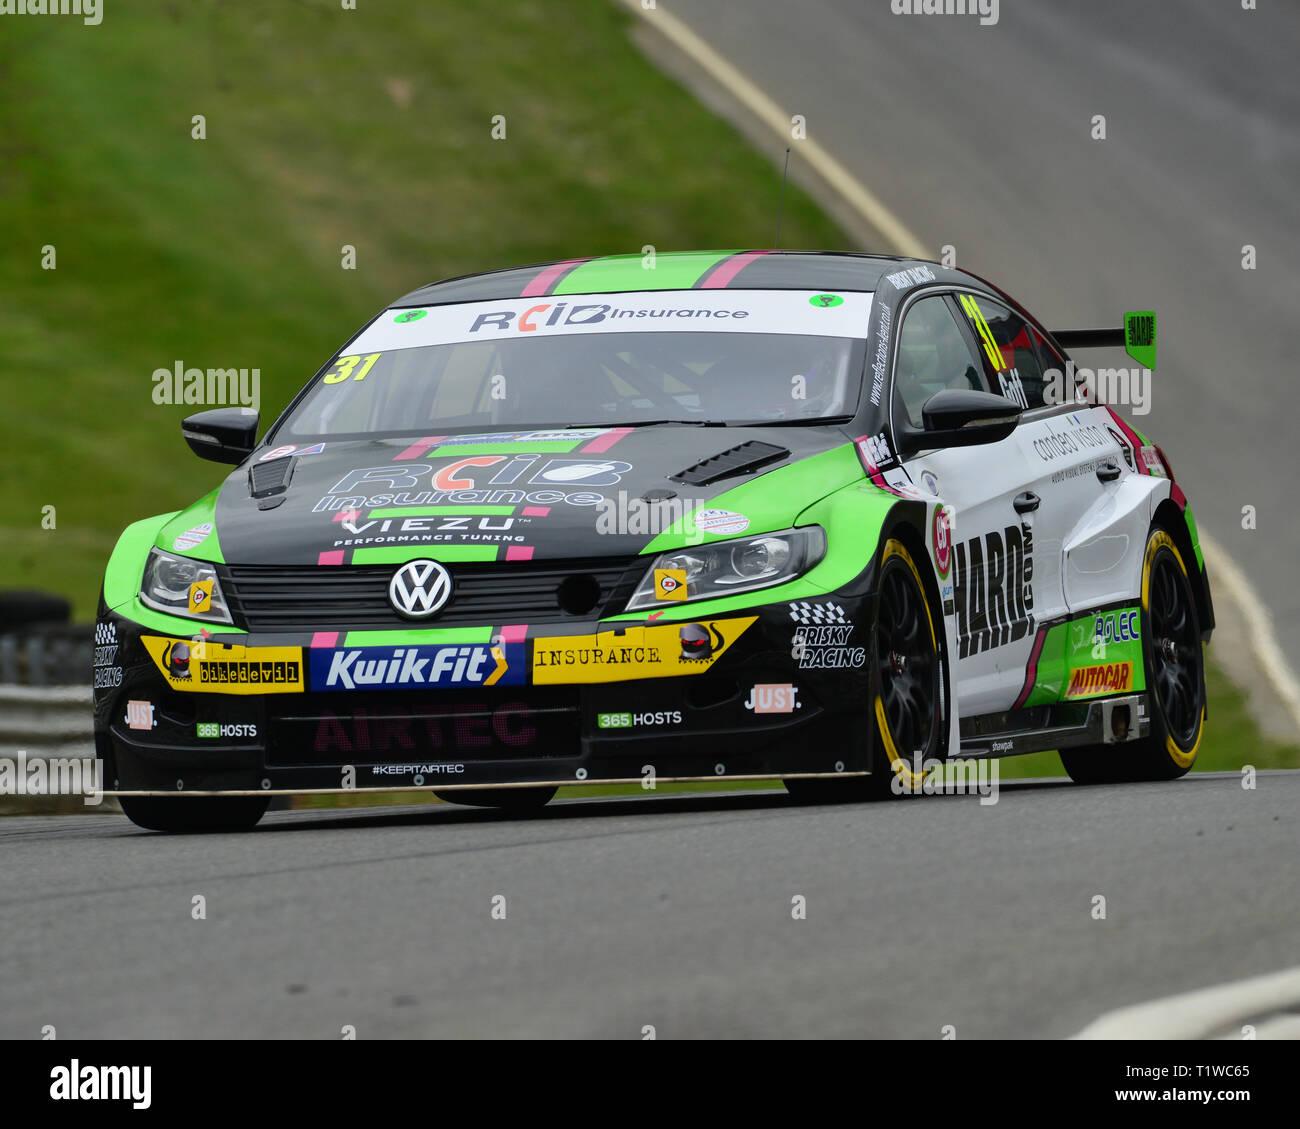 37421150 Jack Goff, Volkswagen CC, BTCC launch day and media event, Brands Hatch,